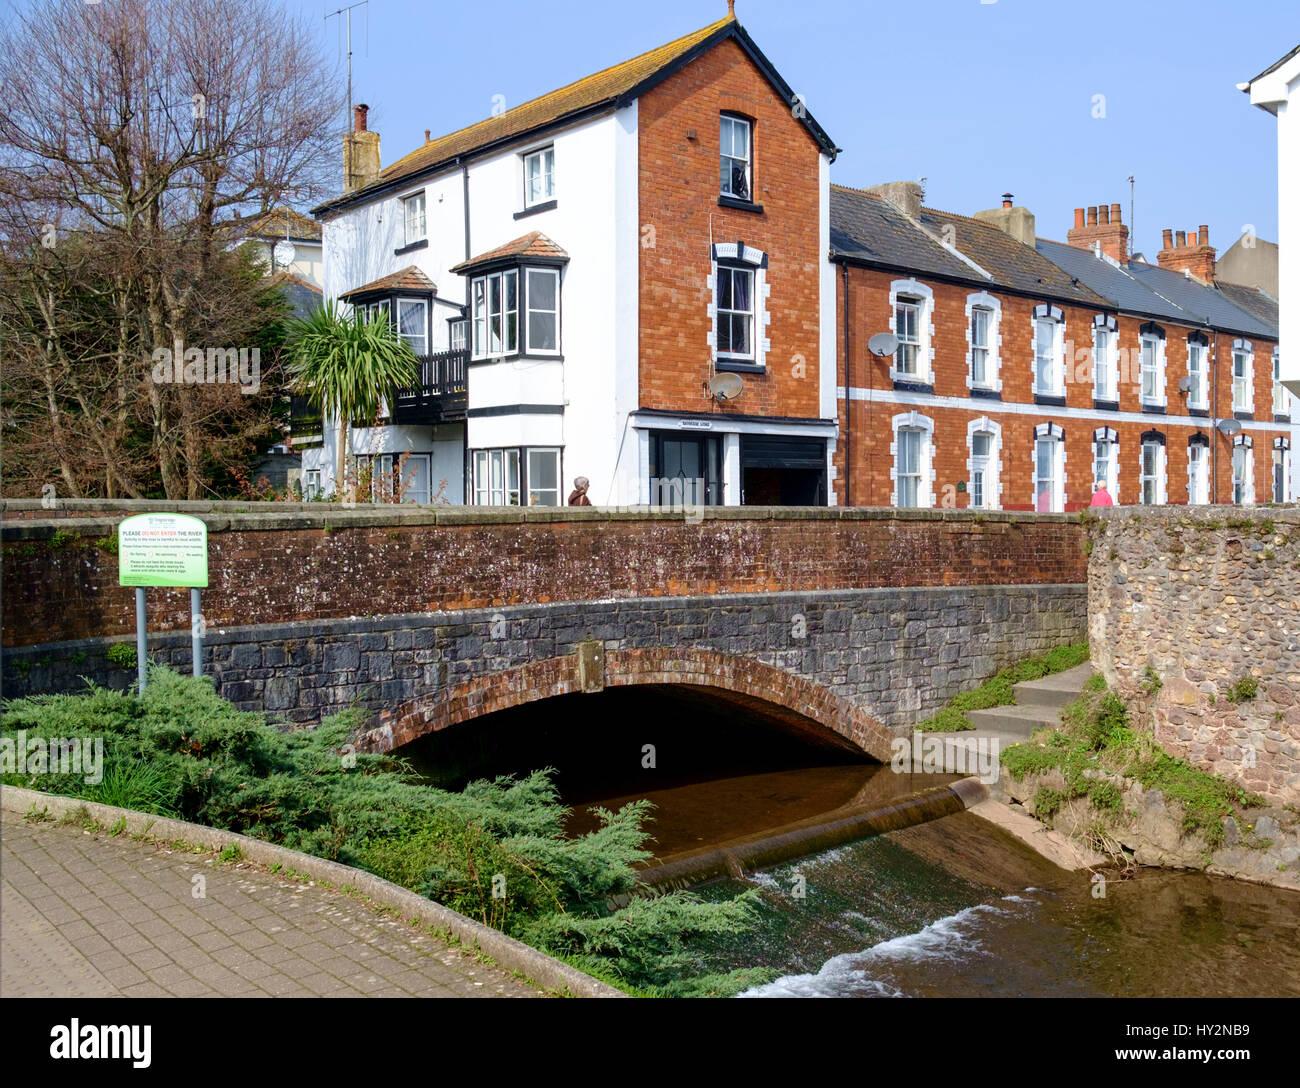 Dawlish a seaside town in South Devon England UK - Stock Image